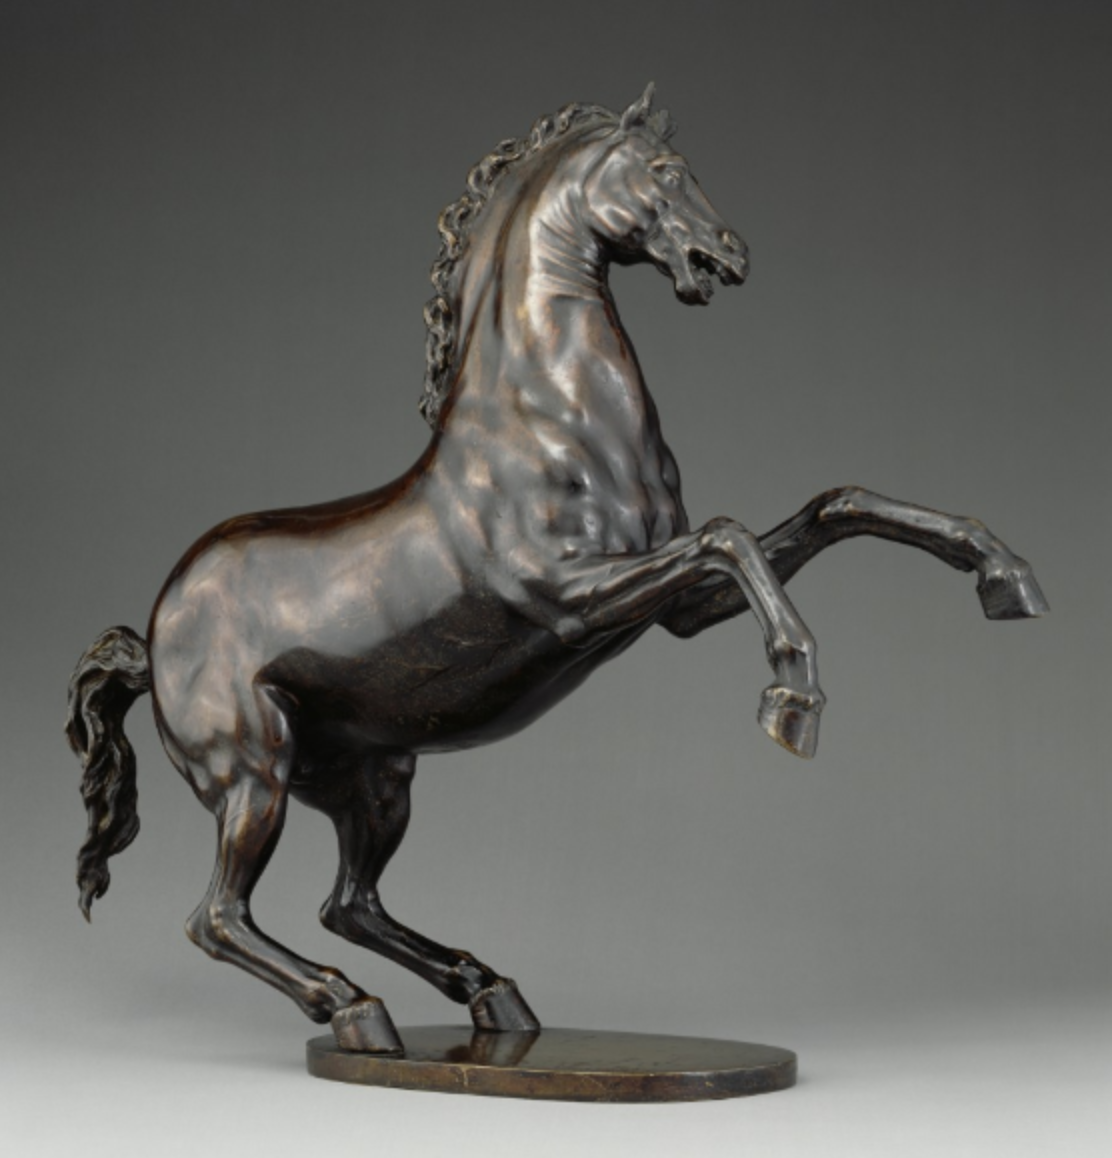 Rearing Horse, 1605-10, Adriaen de Vries, Netherlands